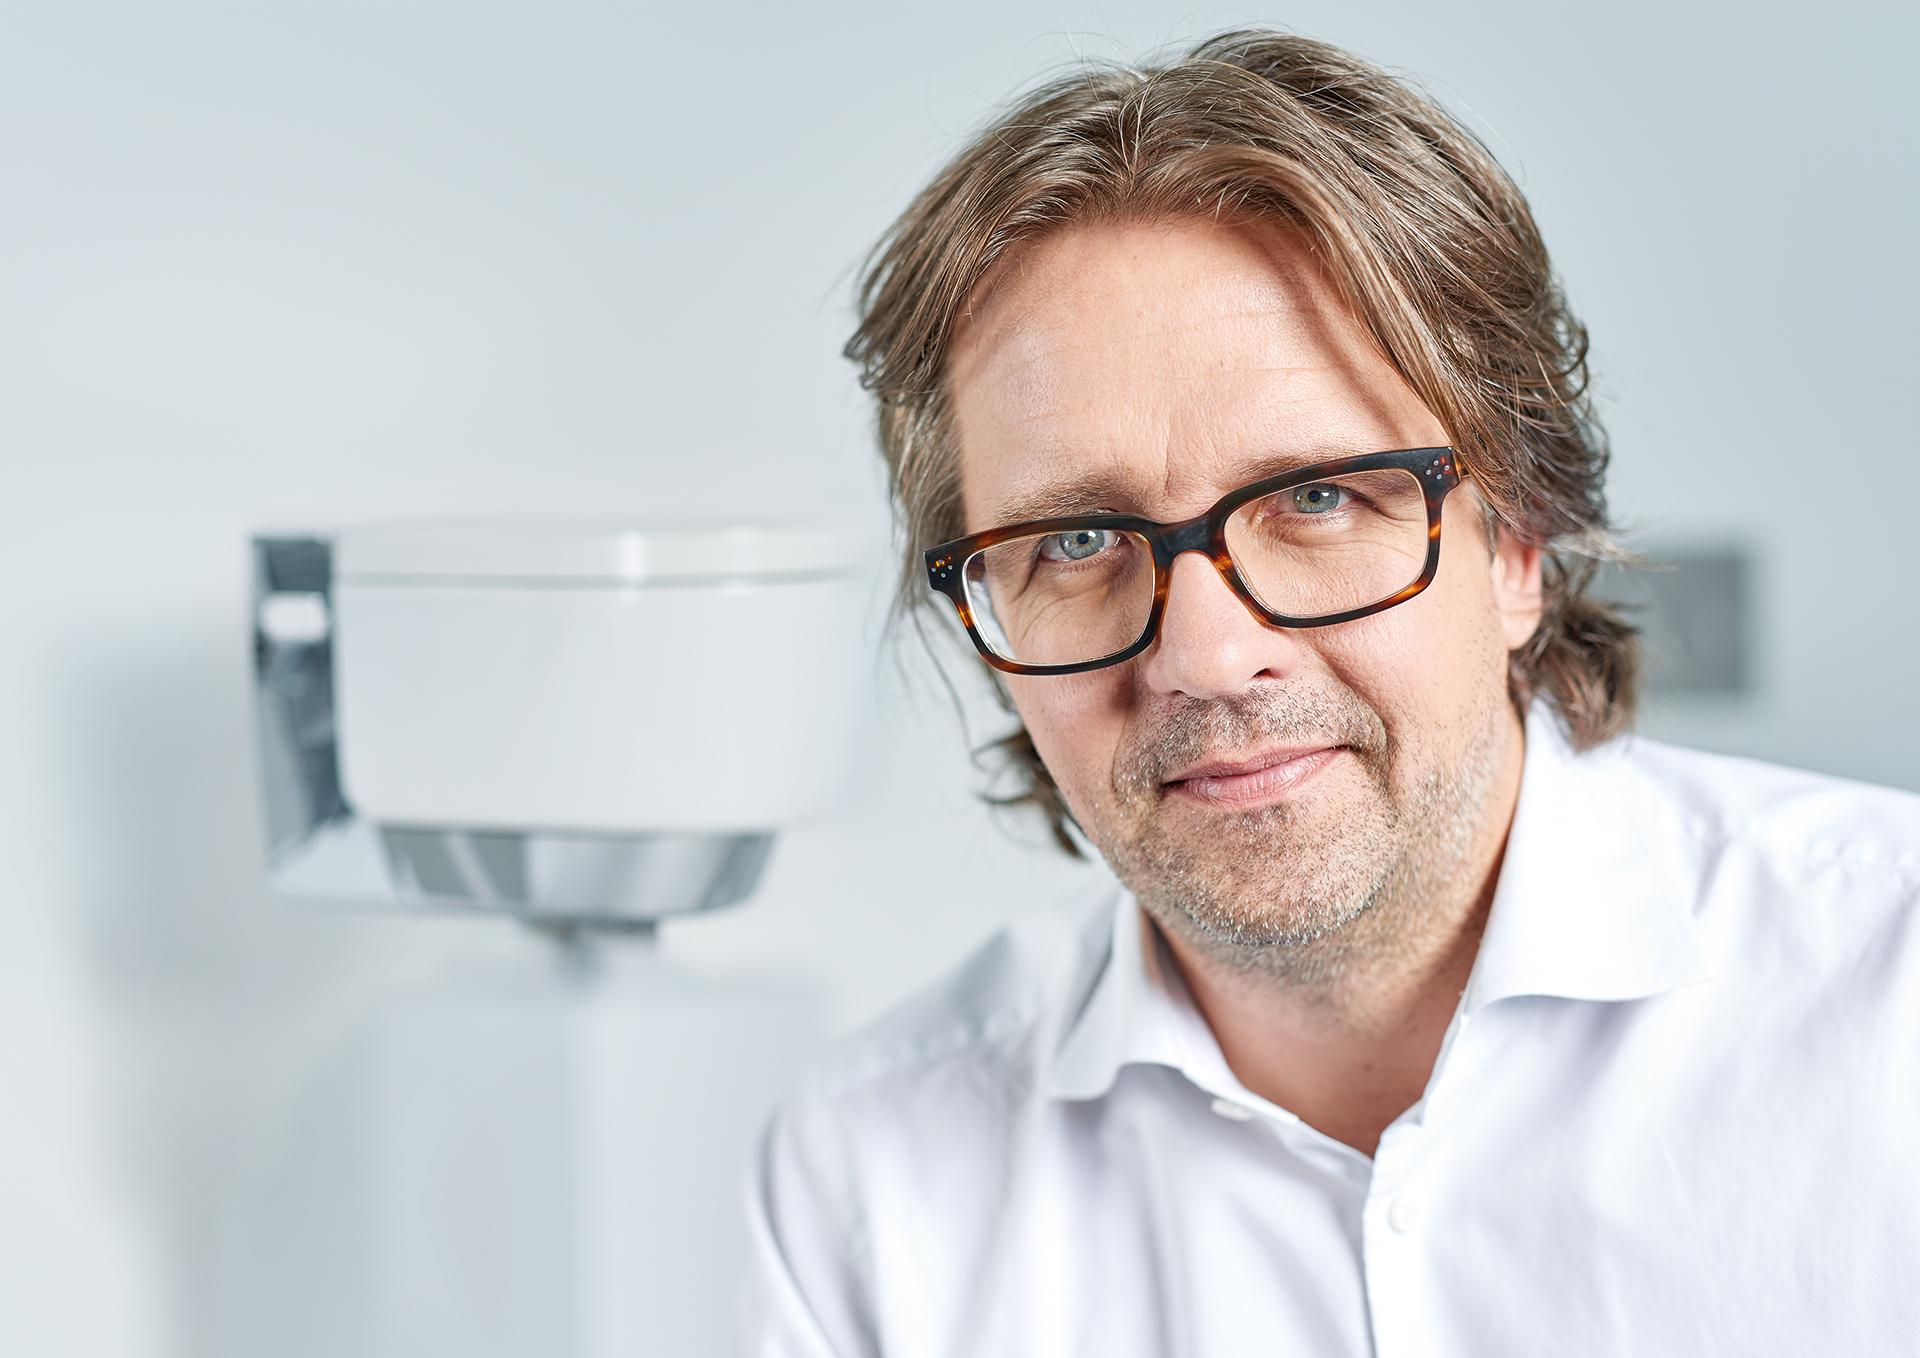 squarerooms-geberit-shower-toilet-designer-engineer-christoph-behling